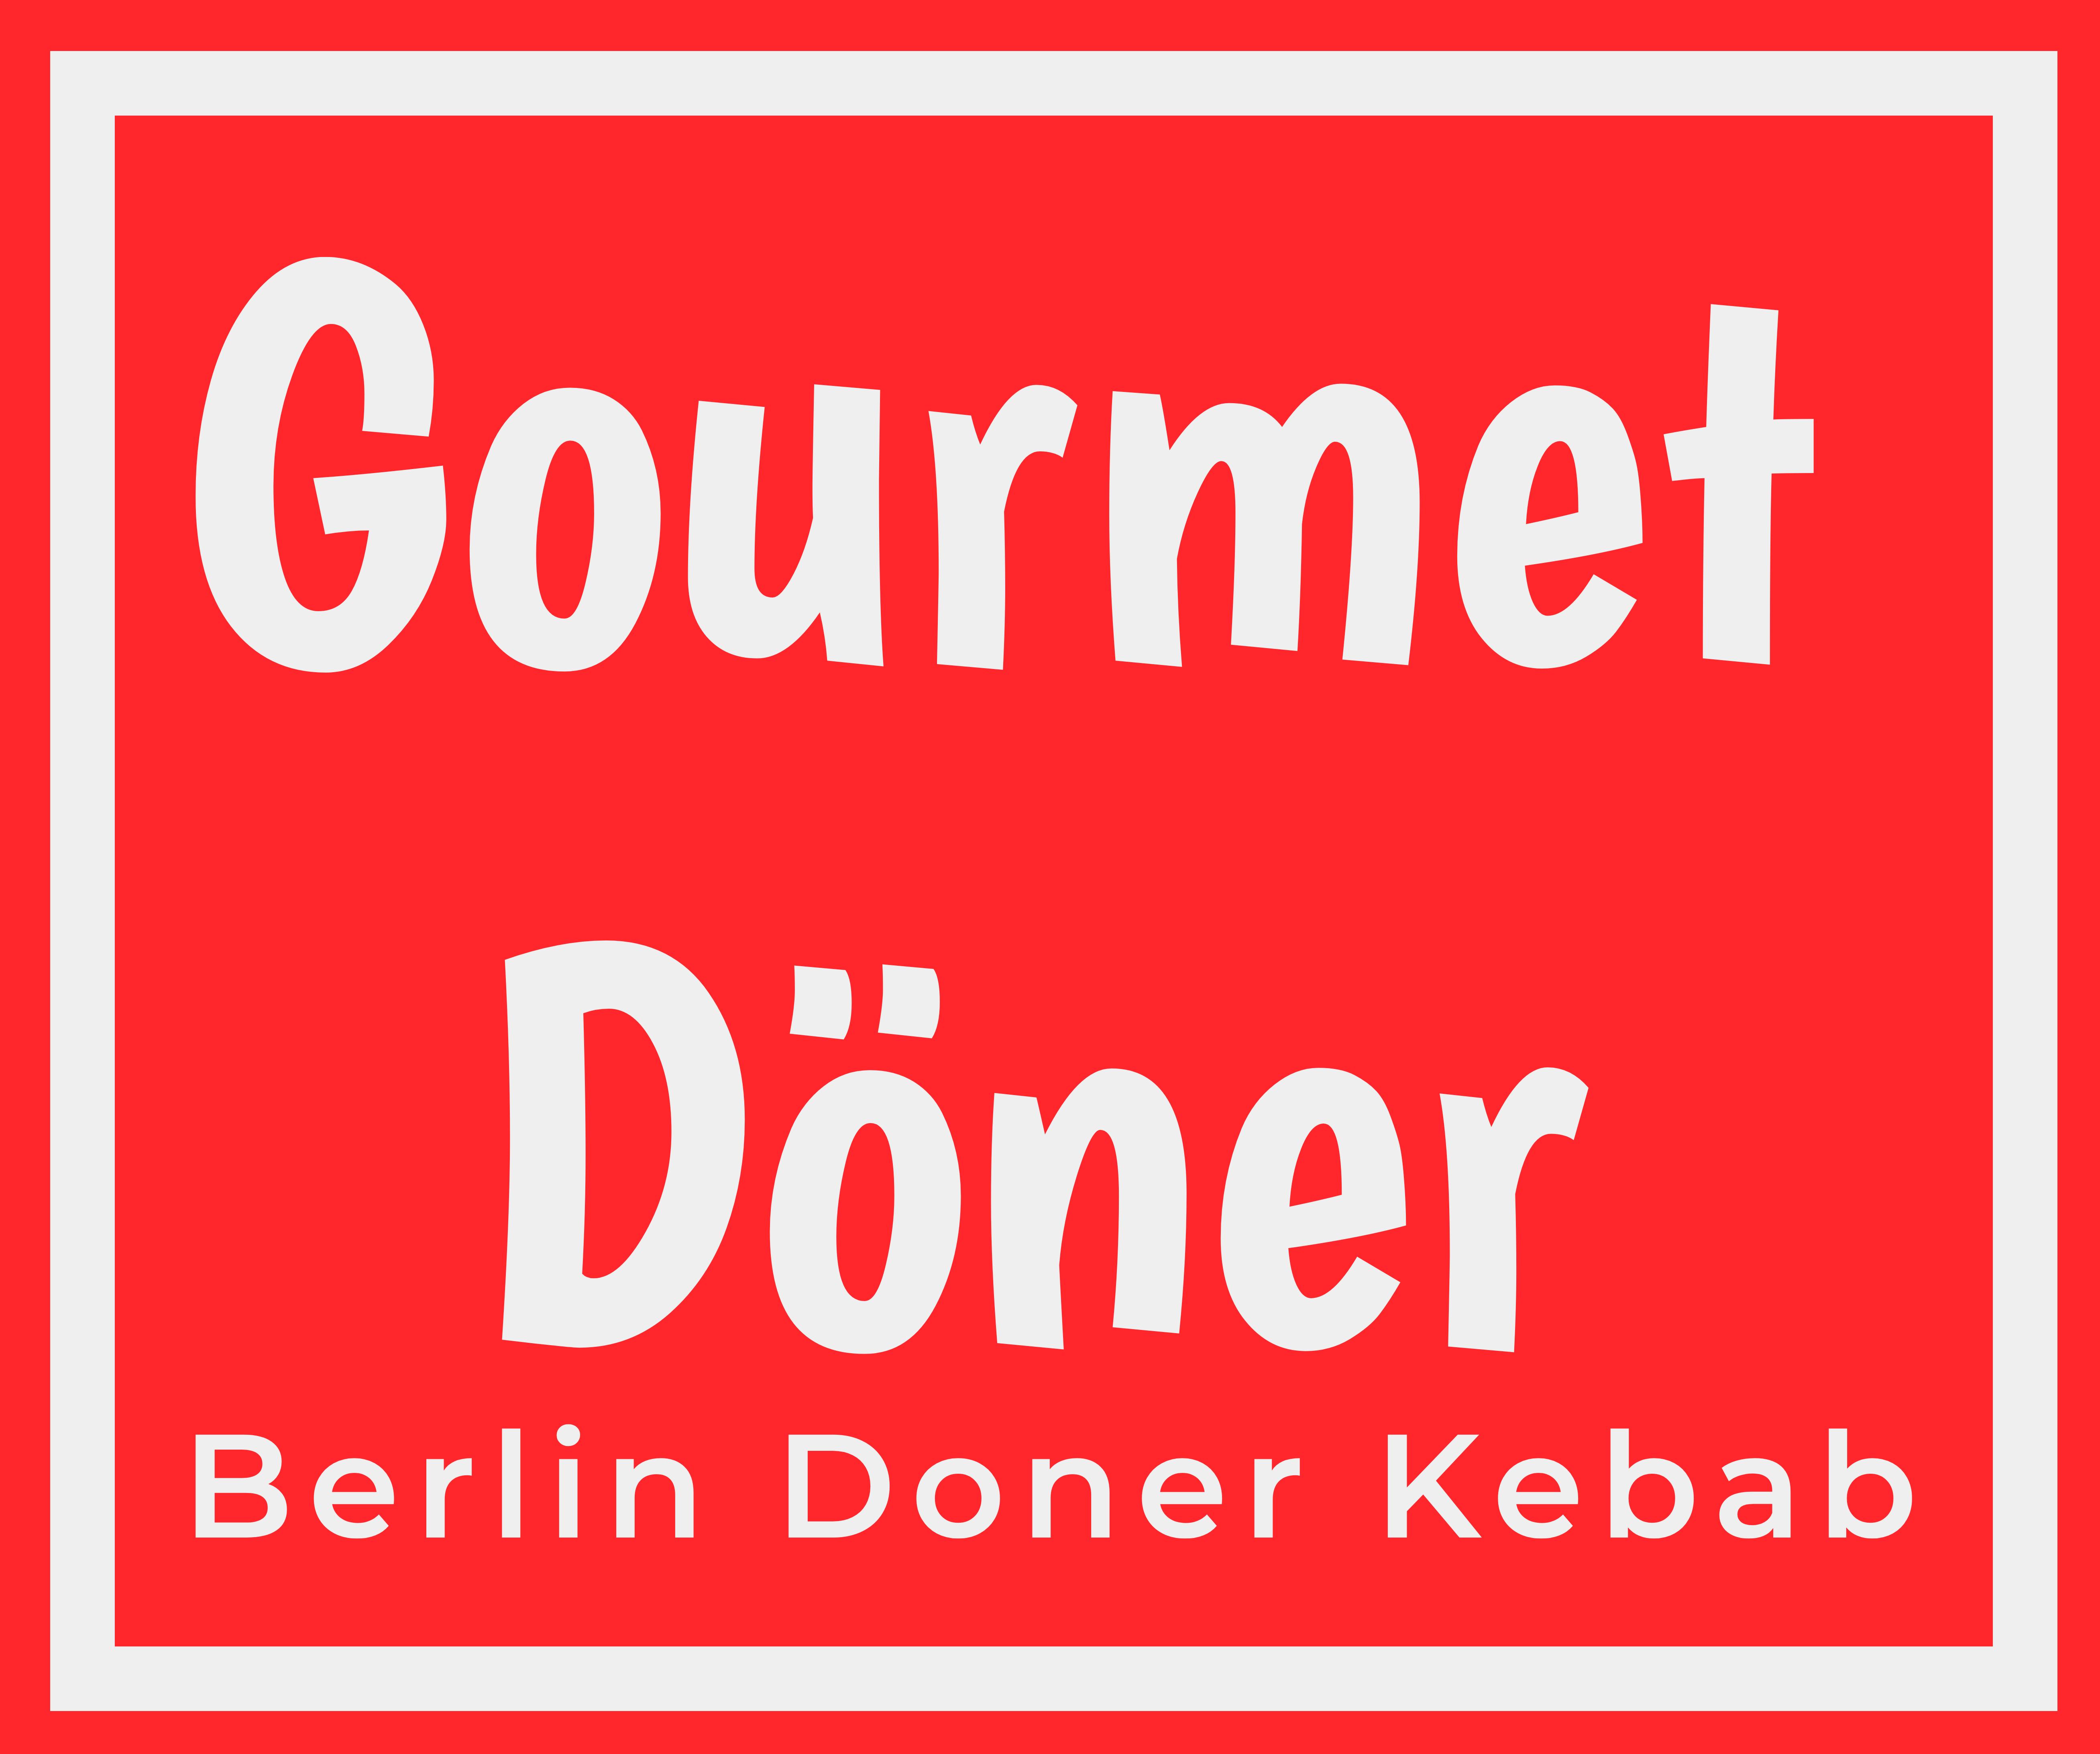 Gourmet Doner